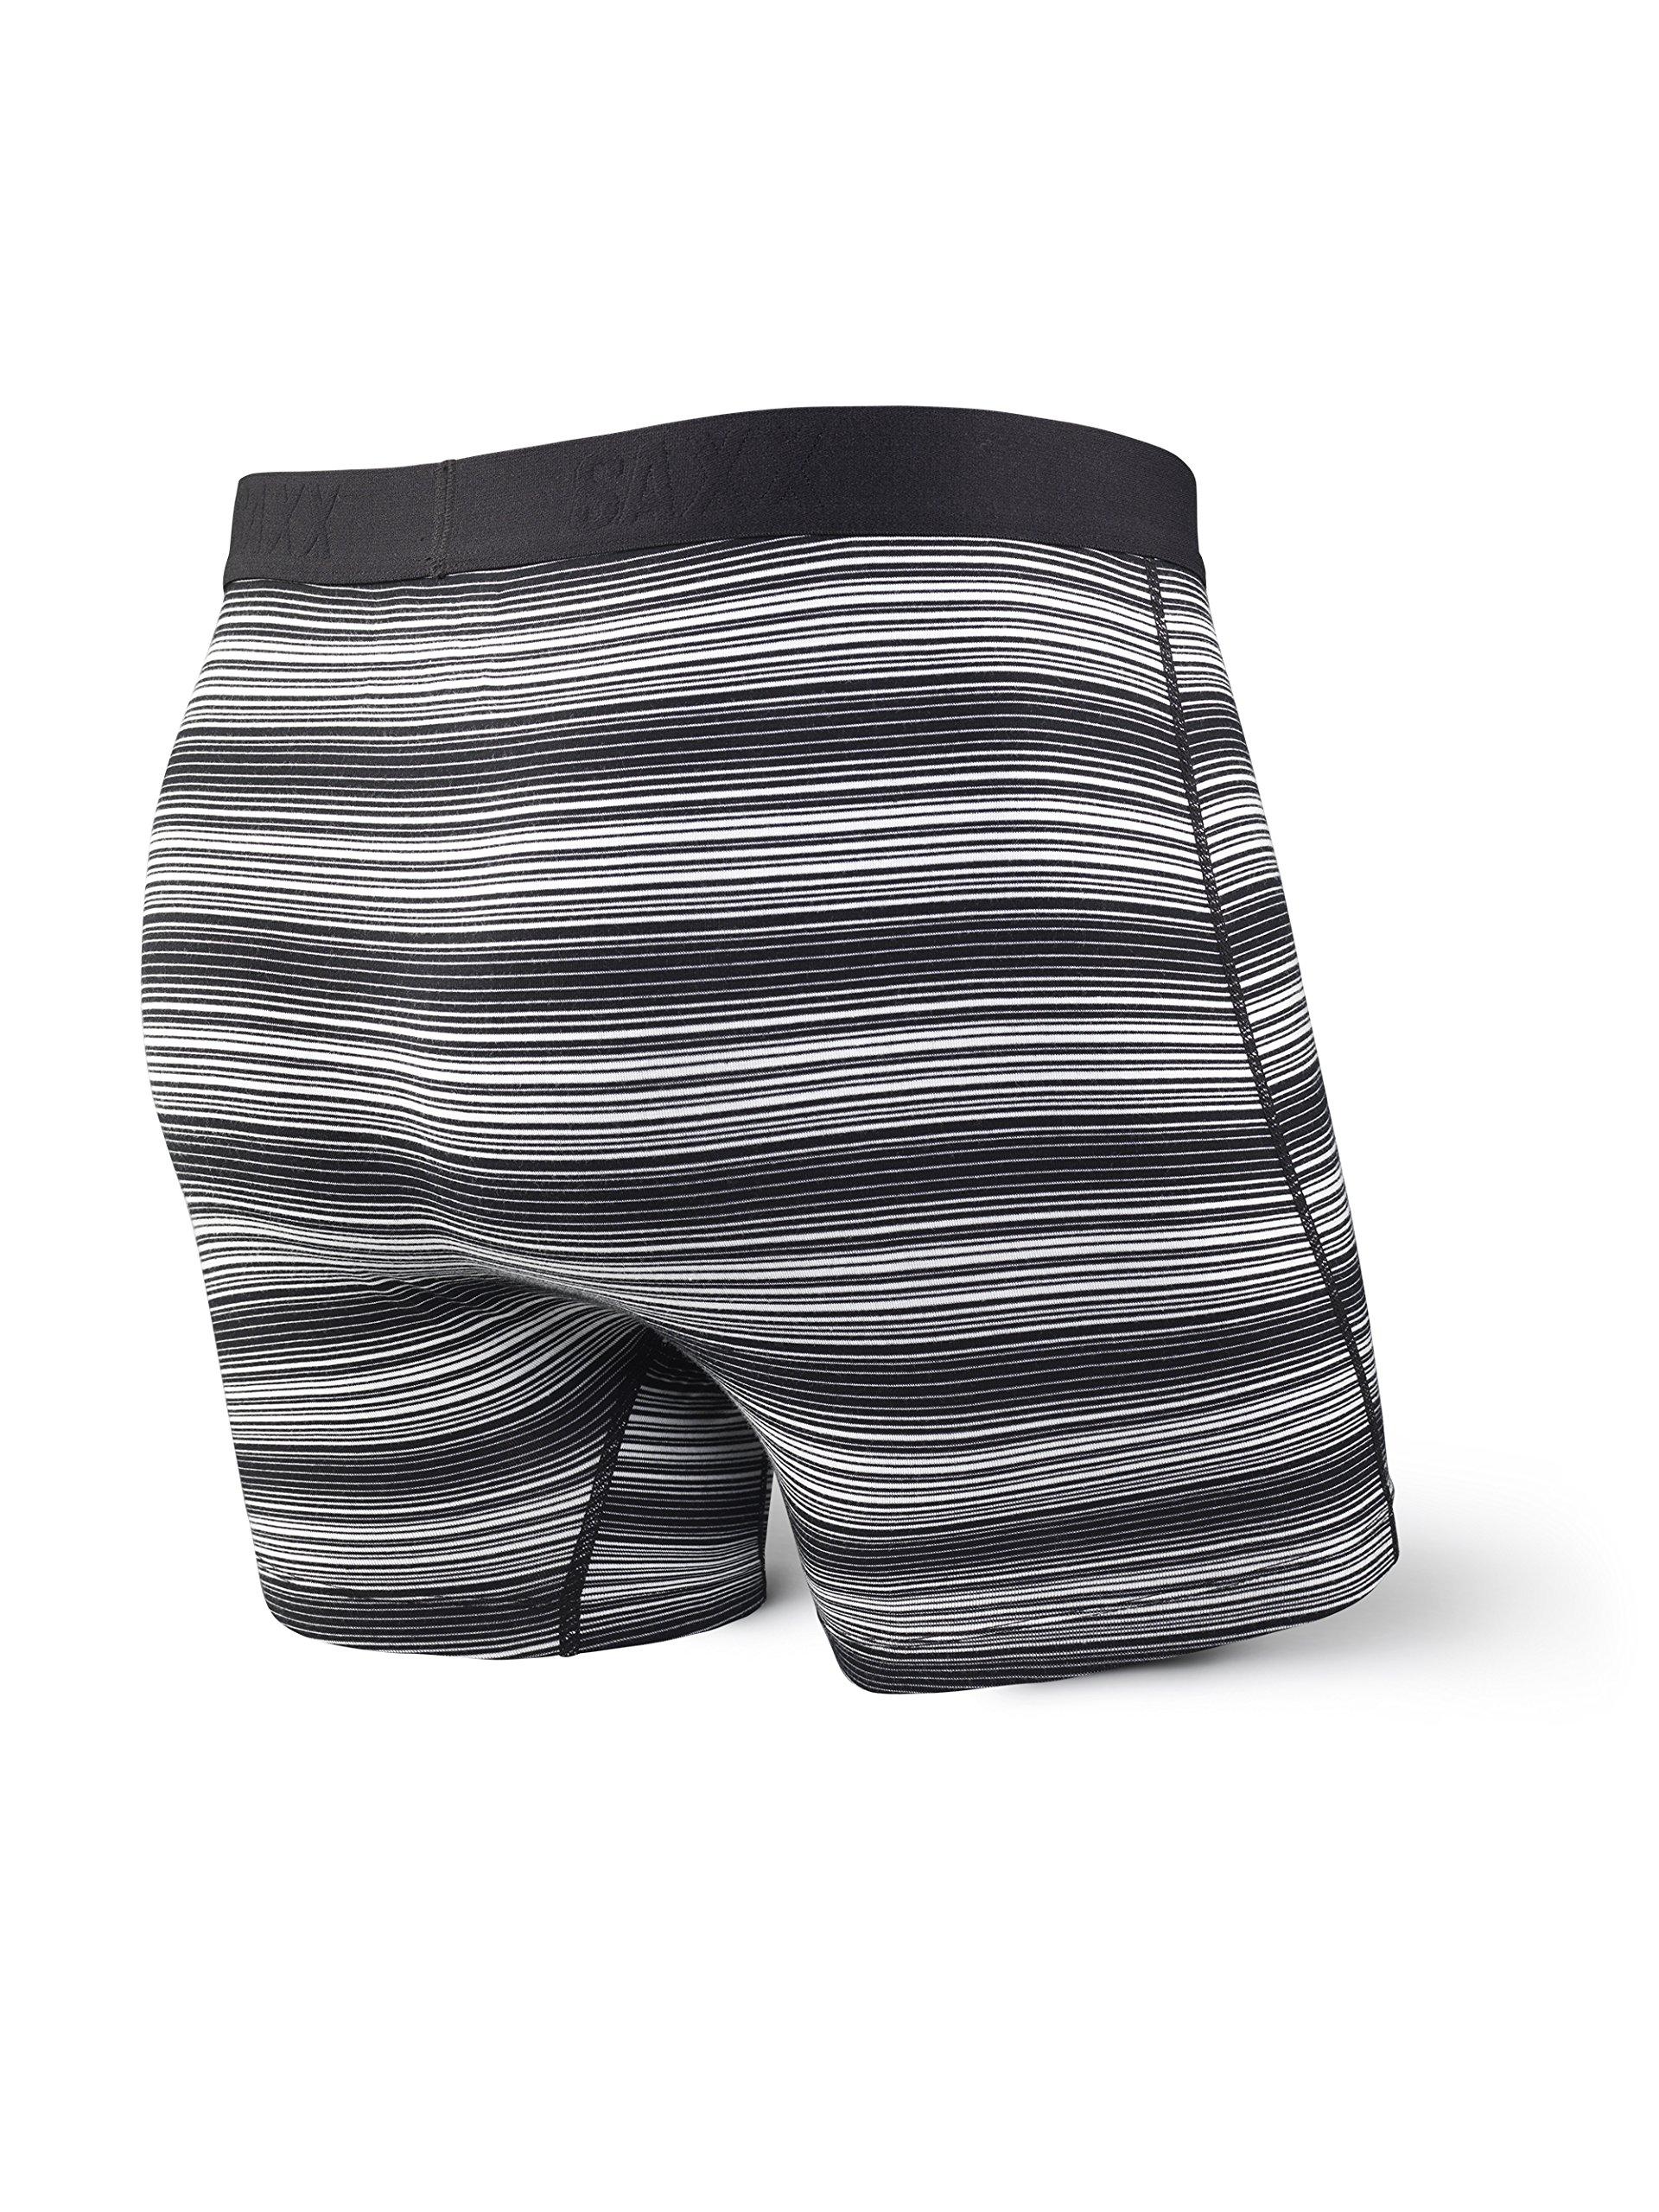 1feceec1e06 Mens Underwear USA • Boxer Briefs • Shop the Saxx Men s Underwear ...